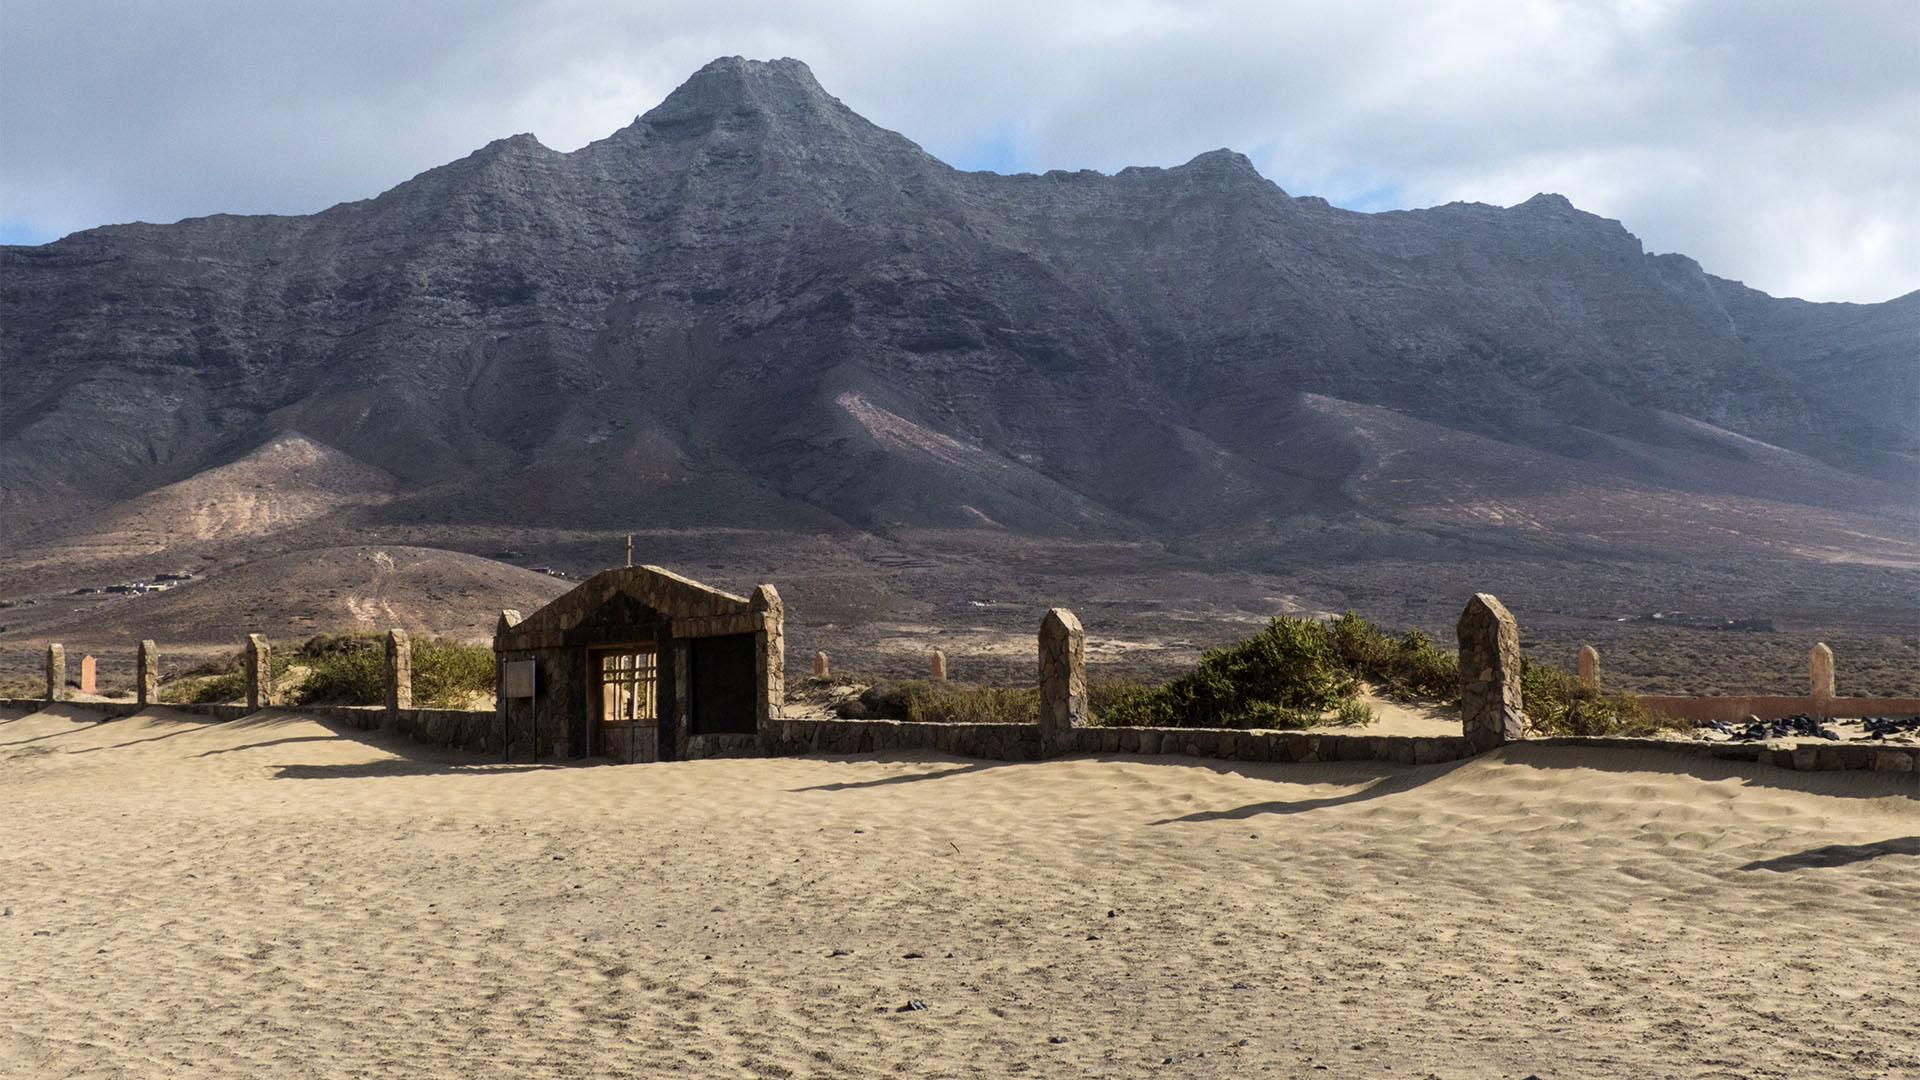 Die Strände Fuerteventuras: Playa de Cofete.